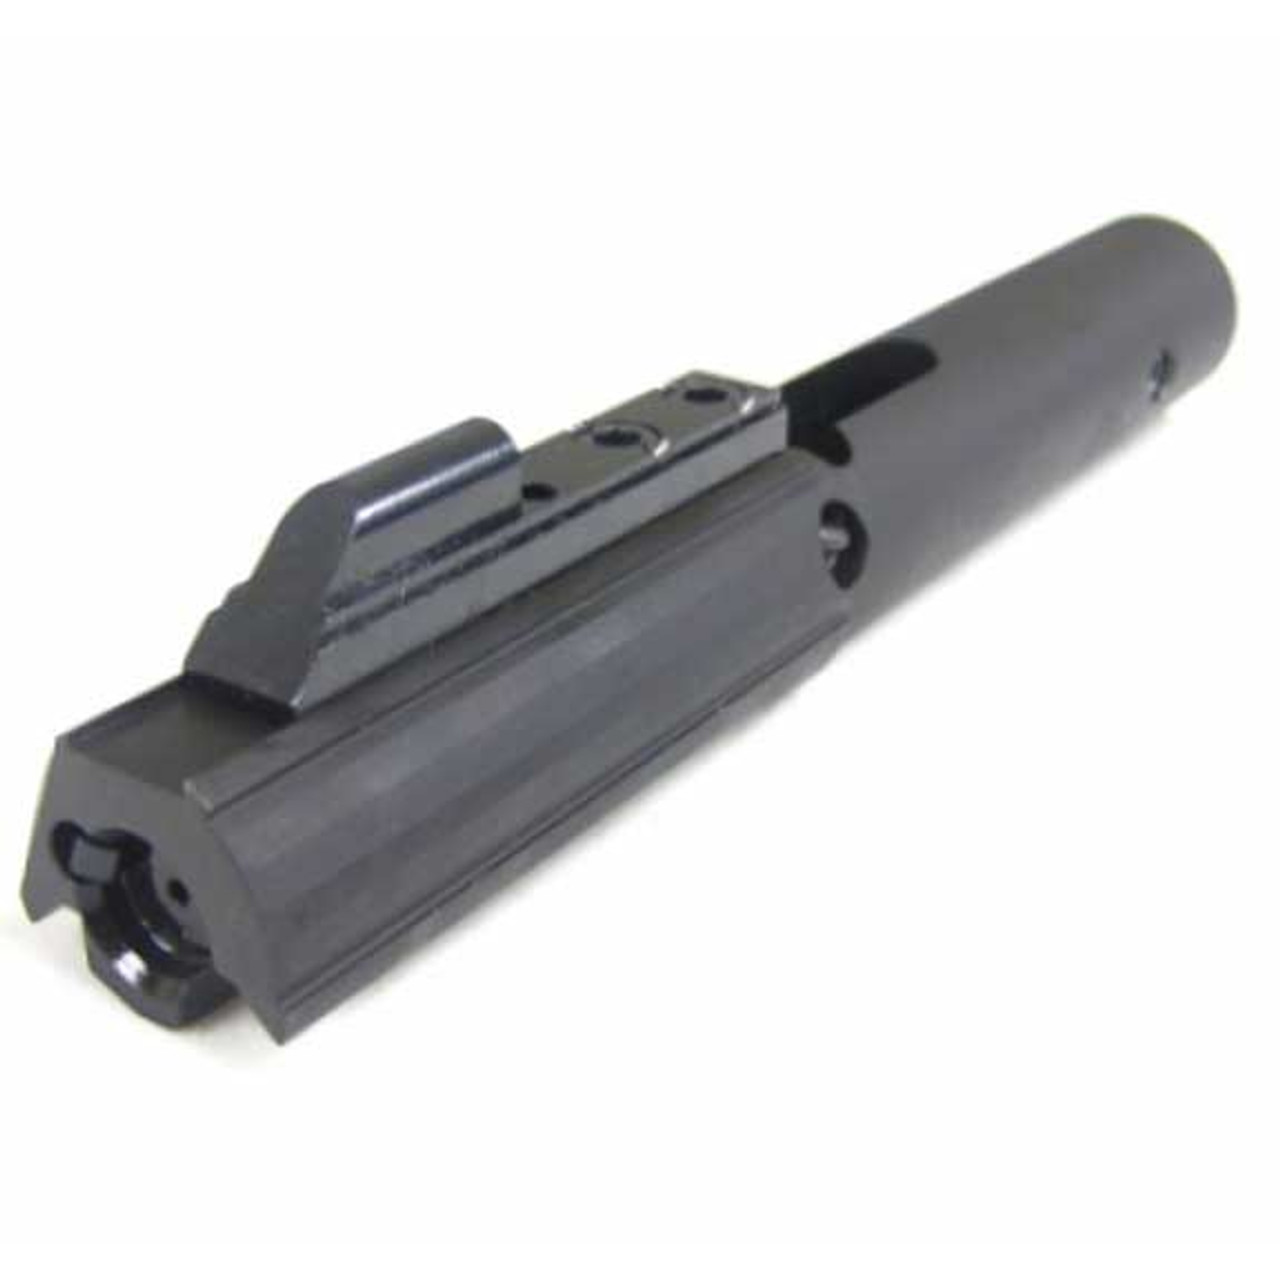 CMMG Ramped 9mm Bolt Assembly